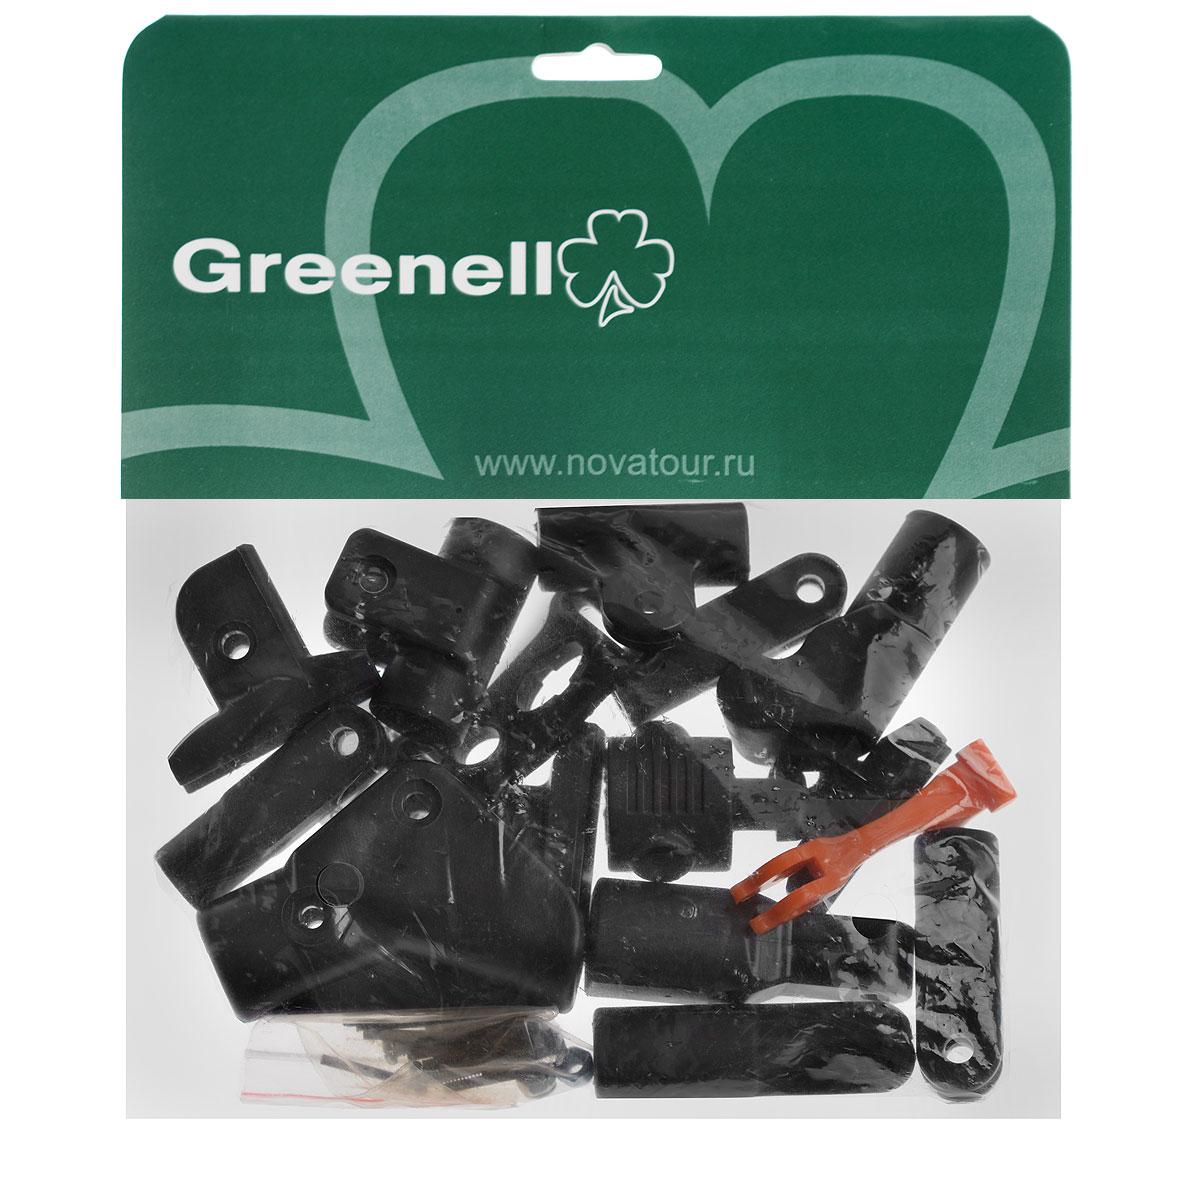 Ремкомплект Greenell №3, для палаток: Nevic, Grange палатка greenell виржиния 6 плюс green